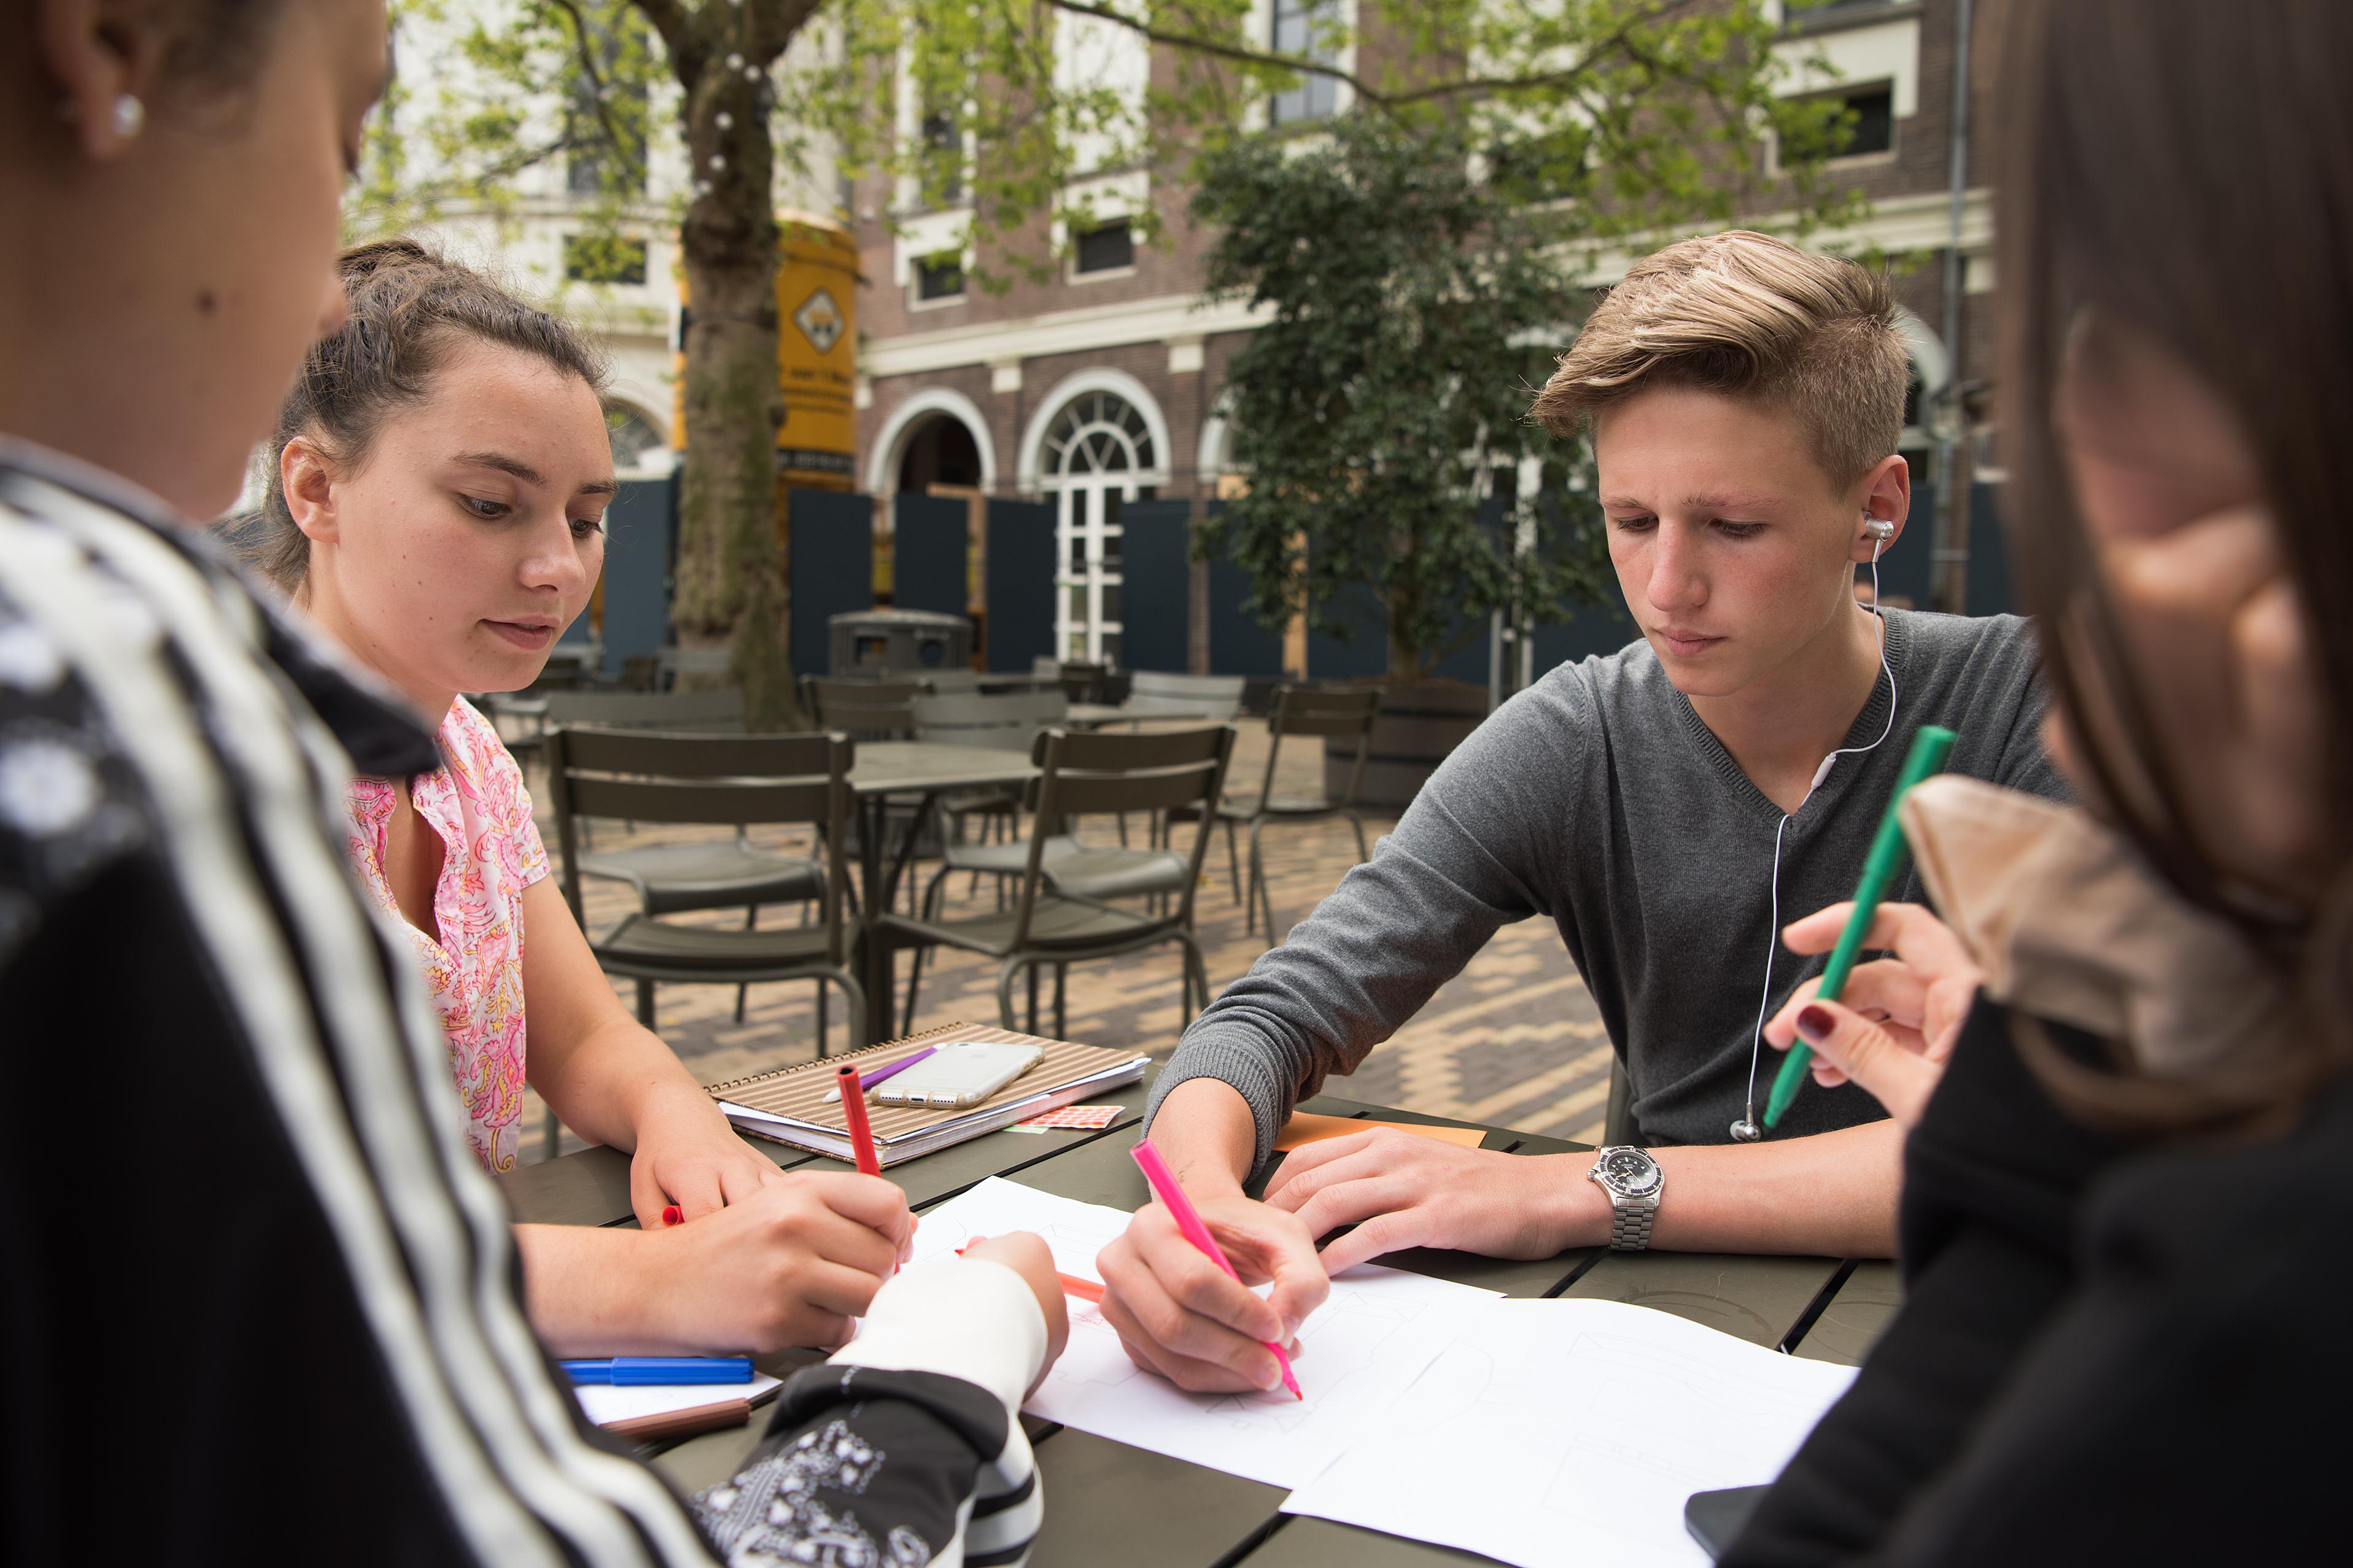 University of Amsterdam Summer School: Business Innovation and Entrepreneurship